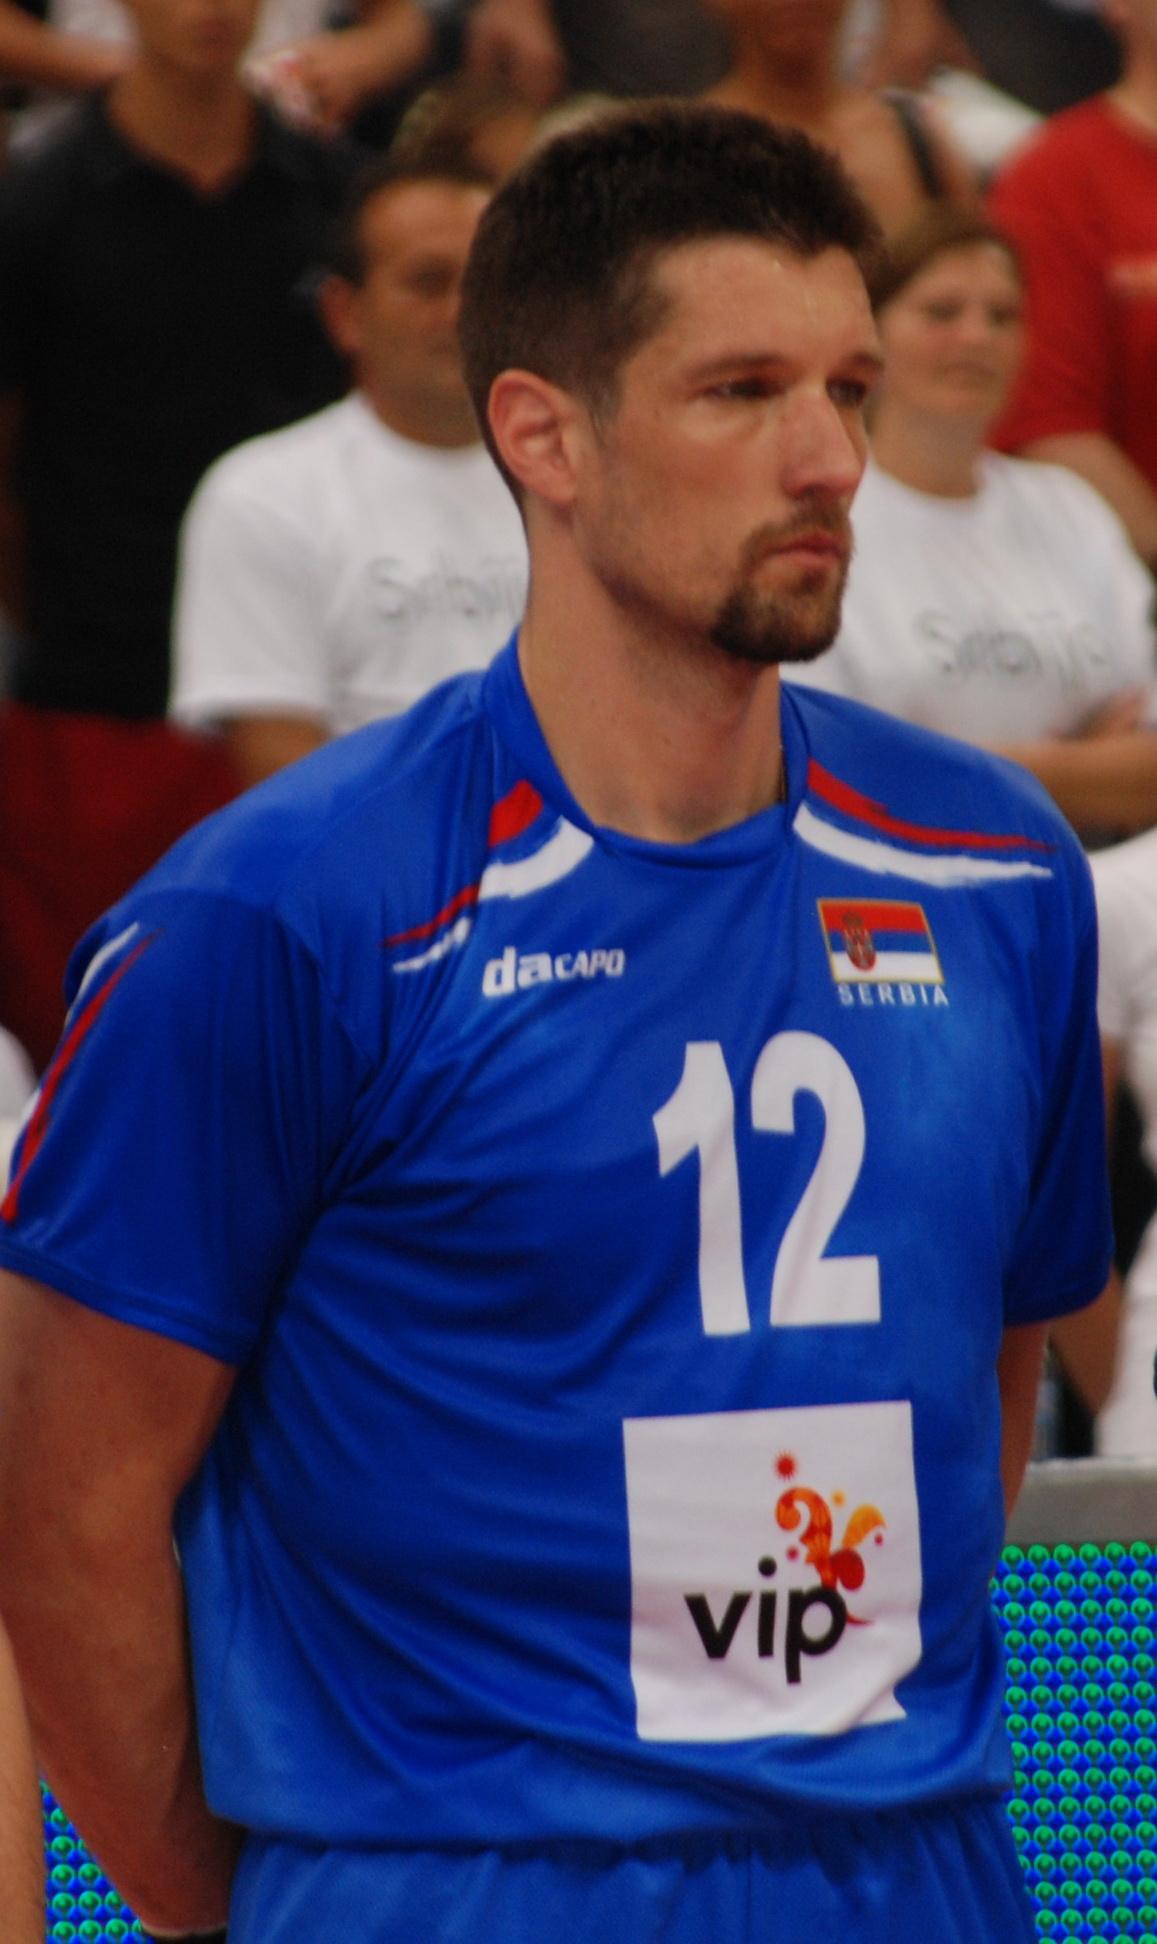 Andrija Gerić, bivši kapiten odbojkaške reprezentacije Srbije, je danas uspešan sportski psiholog | Foto: George M. Groutas, Flickr